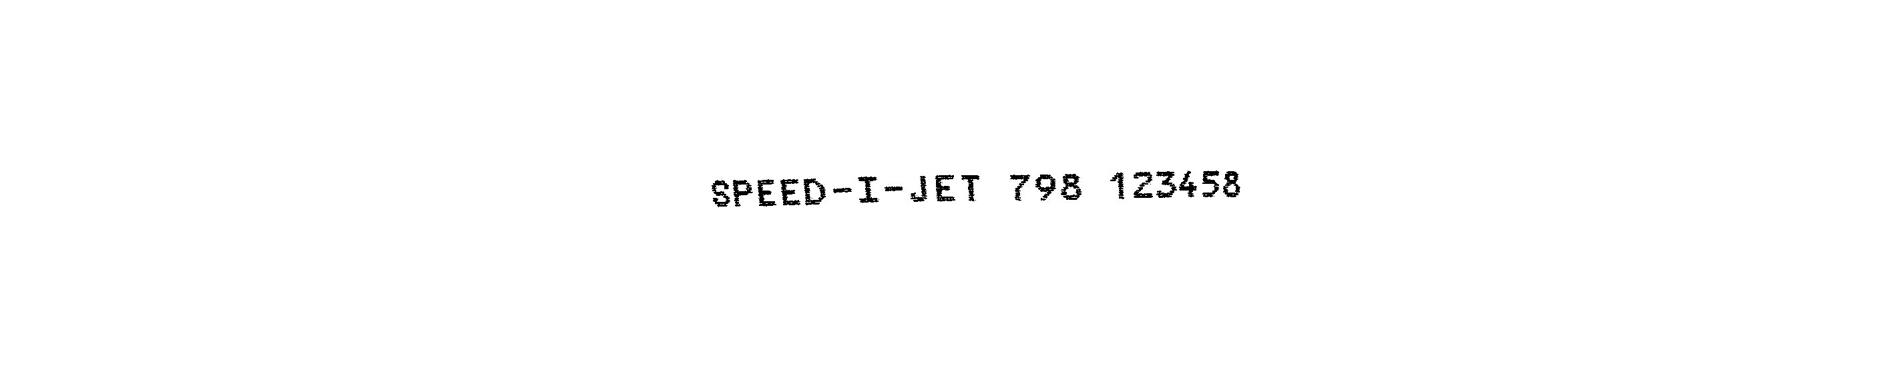 Speed-i-Jet 798_2